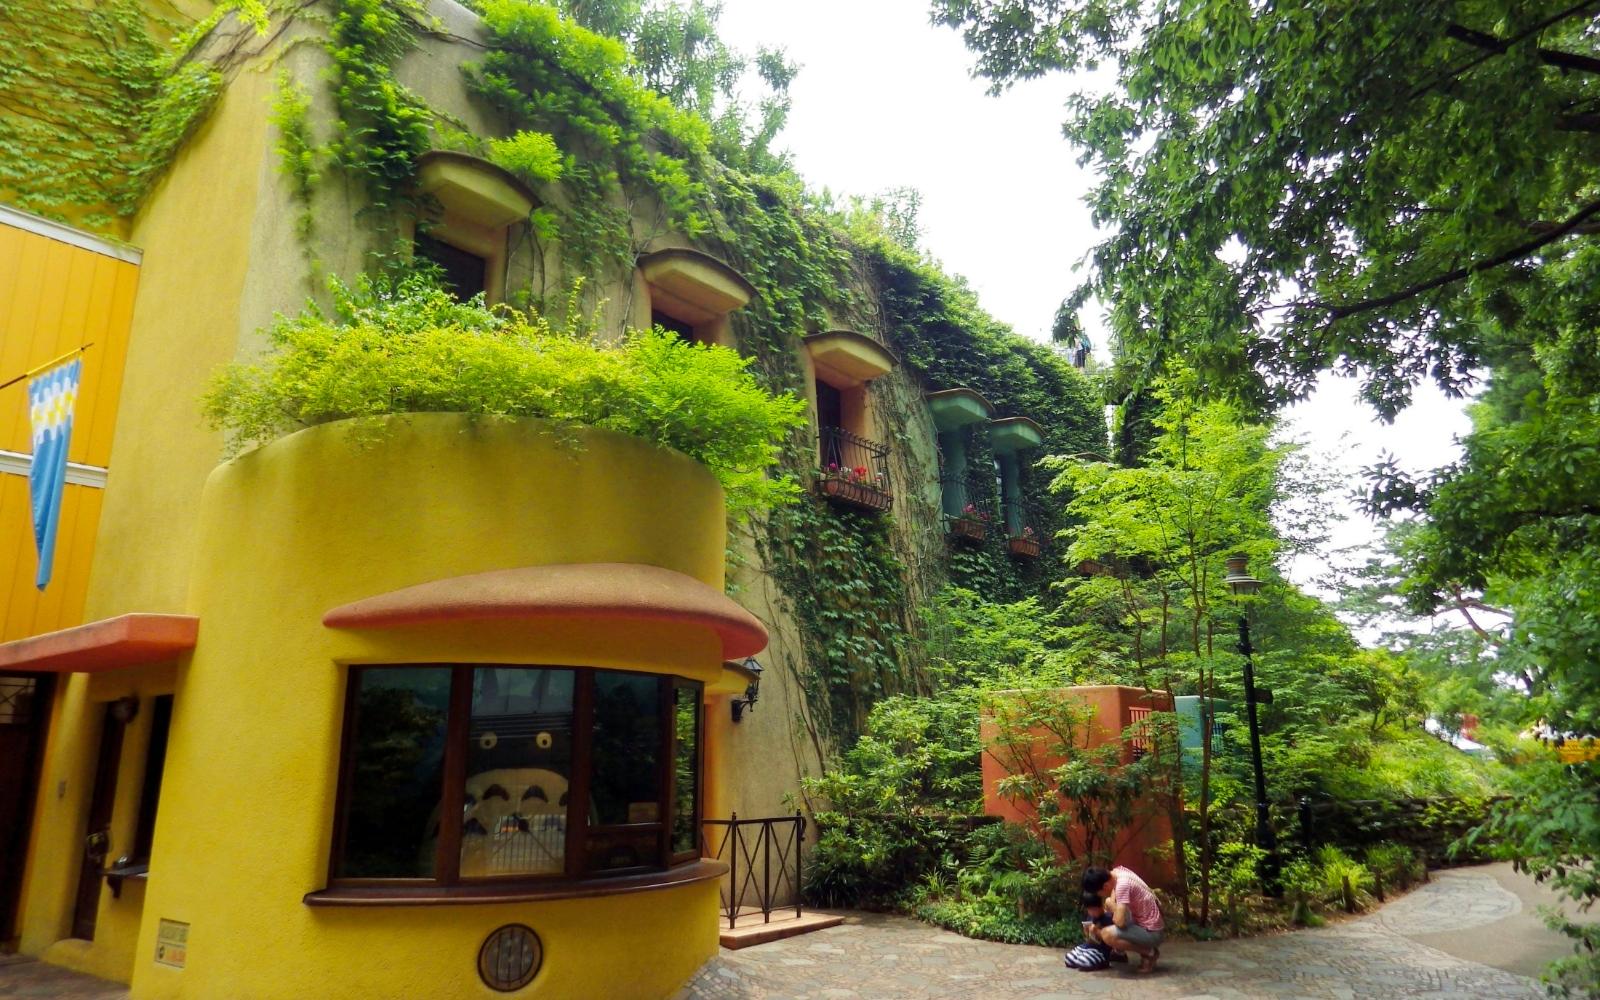 The Ghibli Museum.